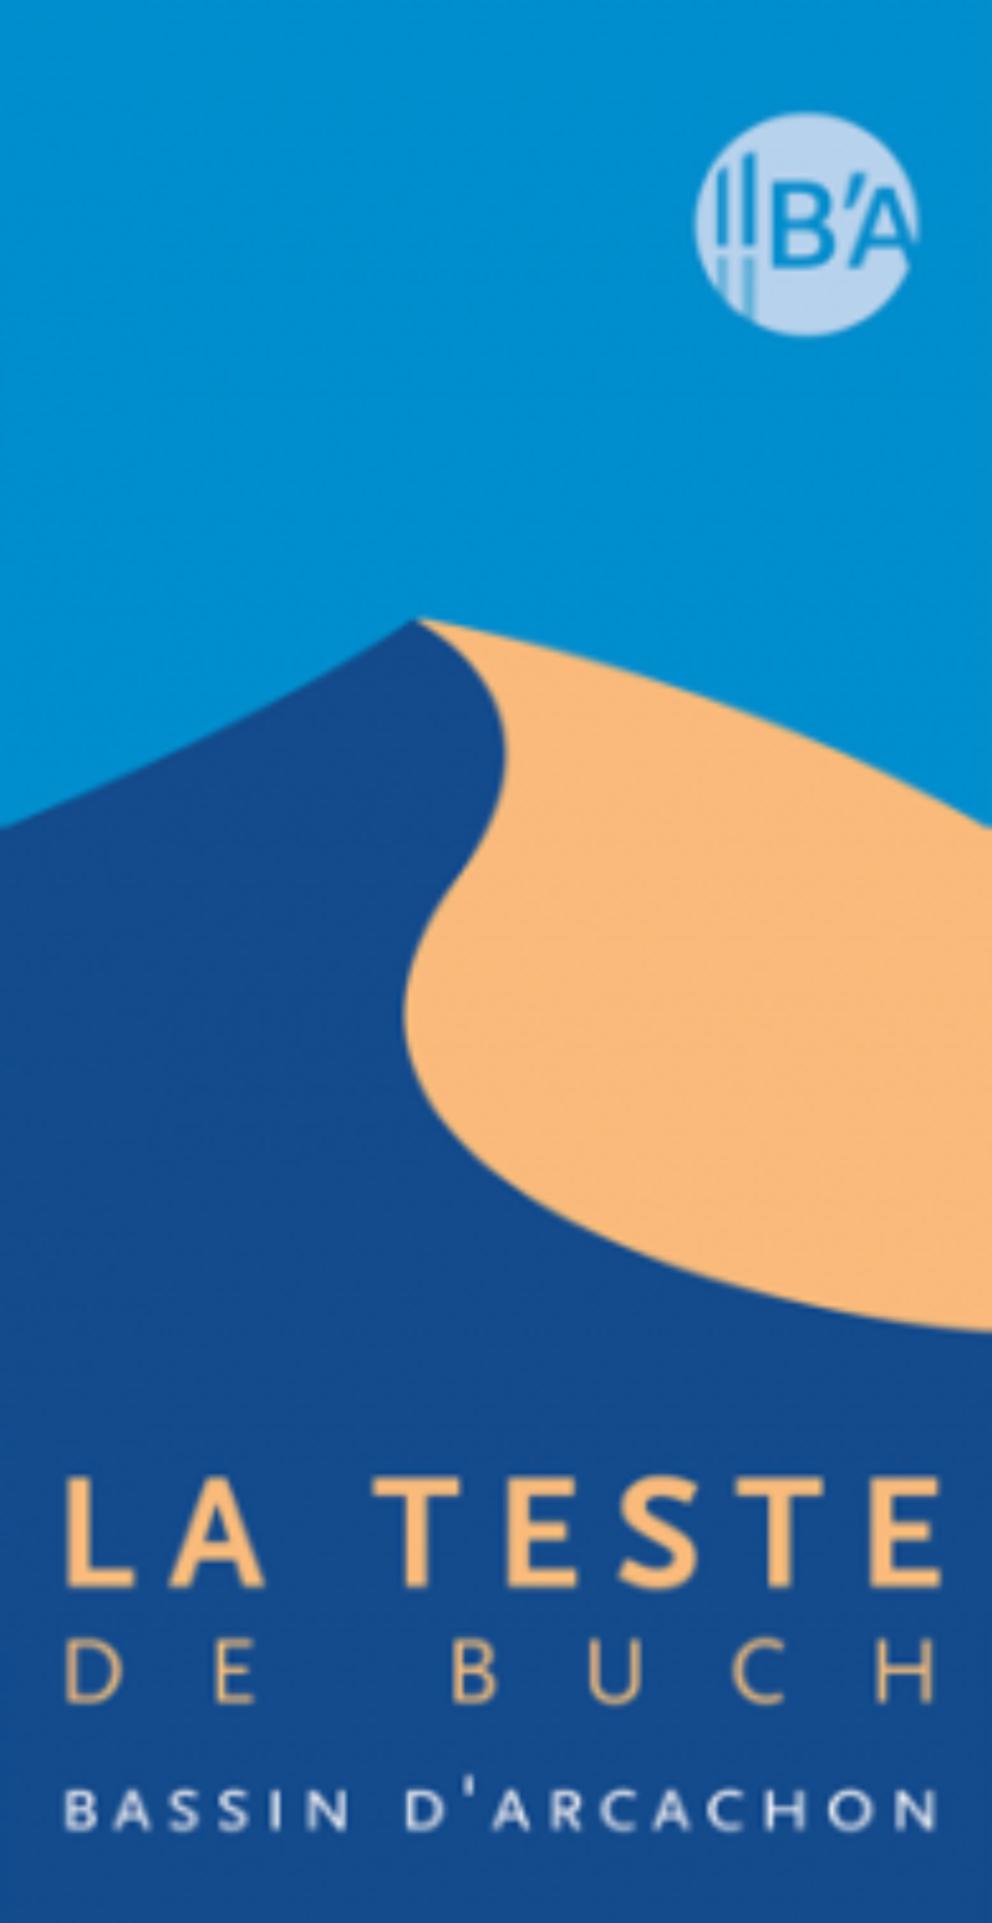 Logo de la ville de La Teste de Buch